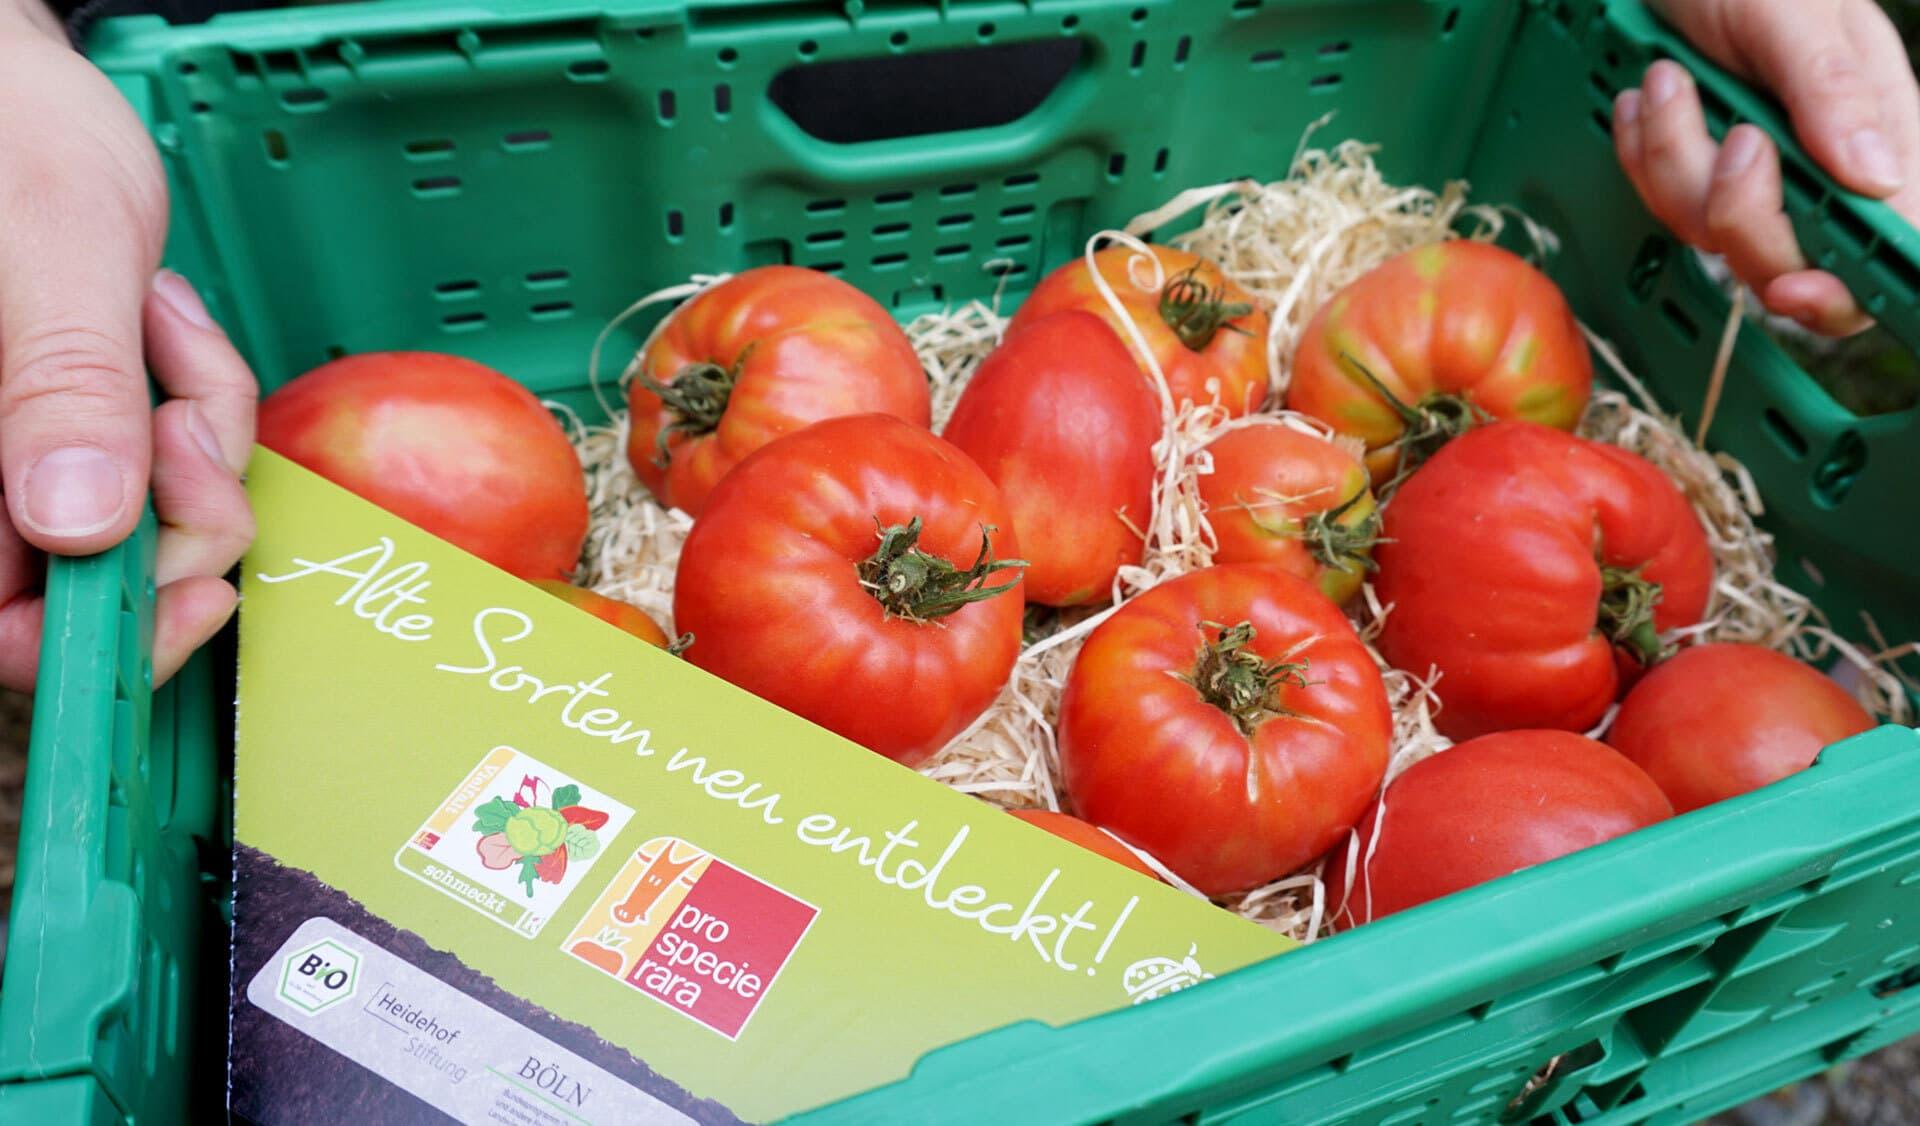 Kiste mit Ochsenherzen-Tomaten